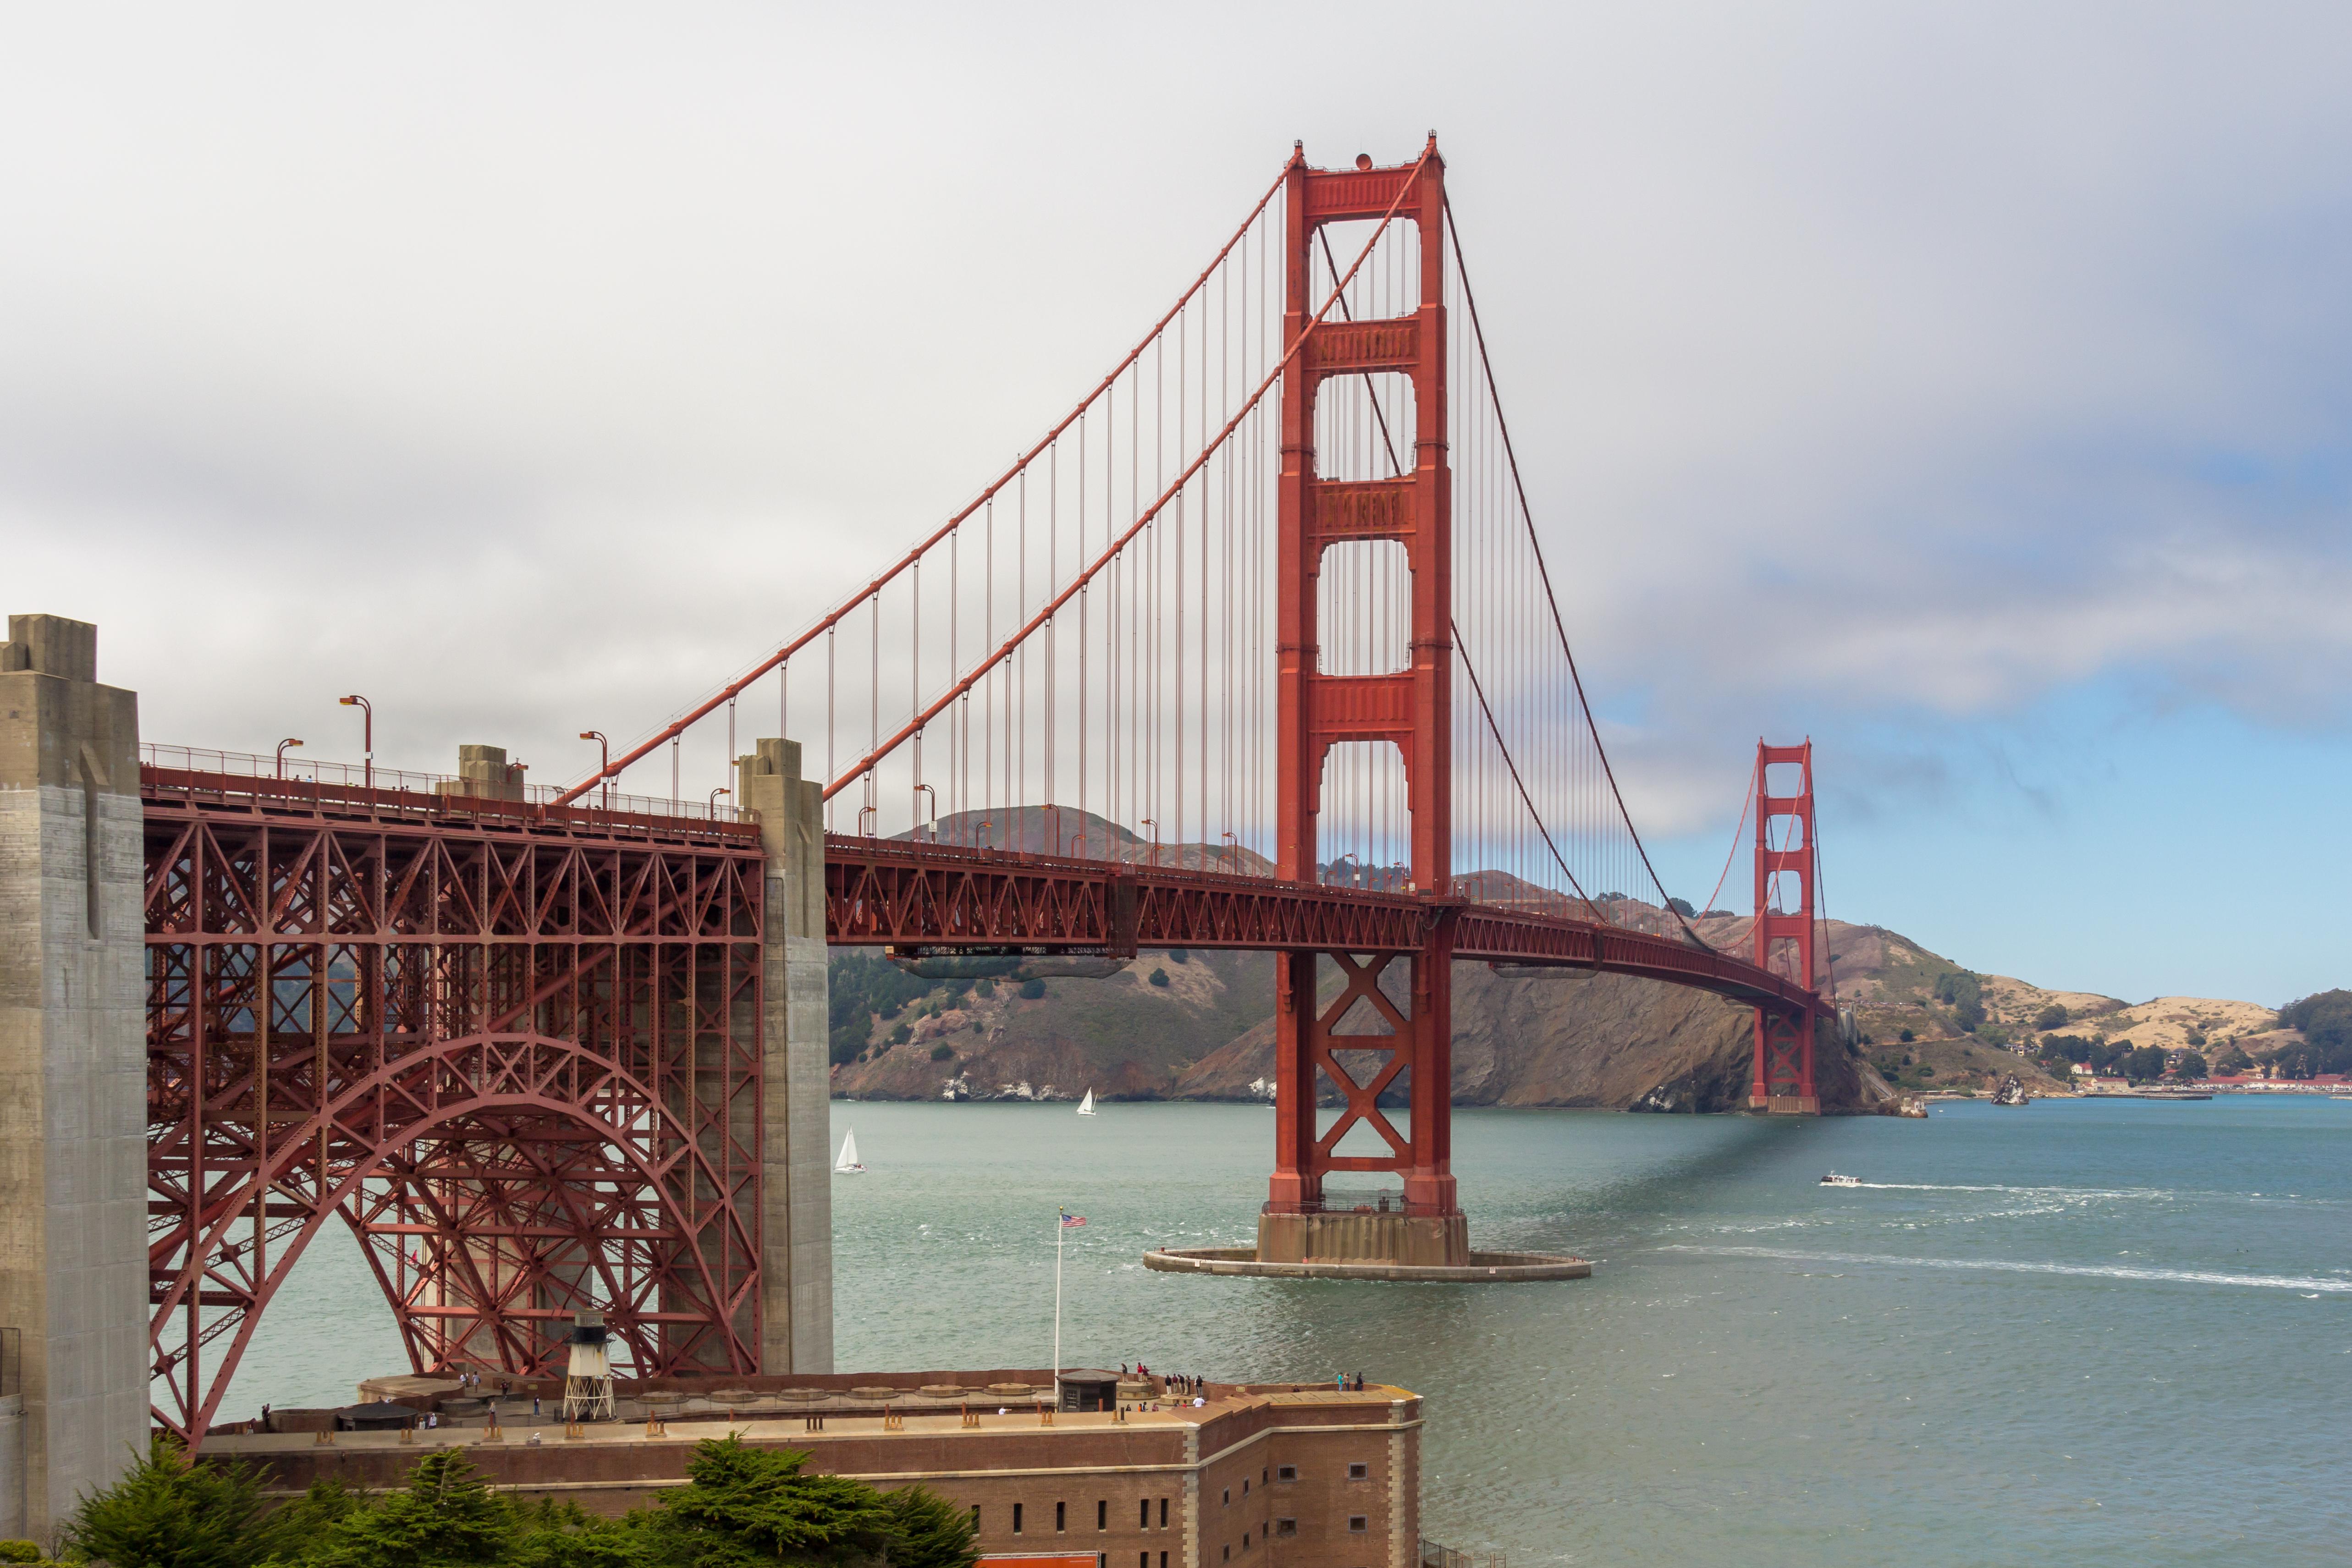 Golden Gate Bridge San Francisco California · Free Stock Photo